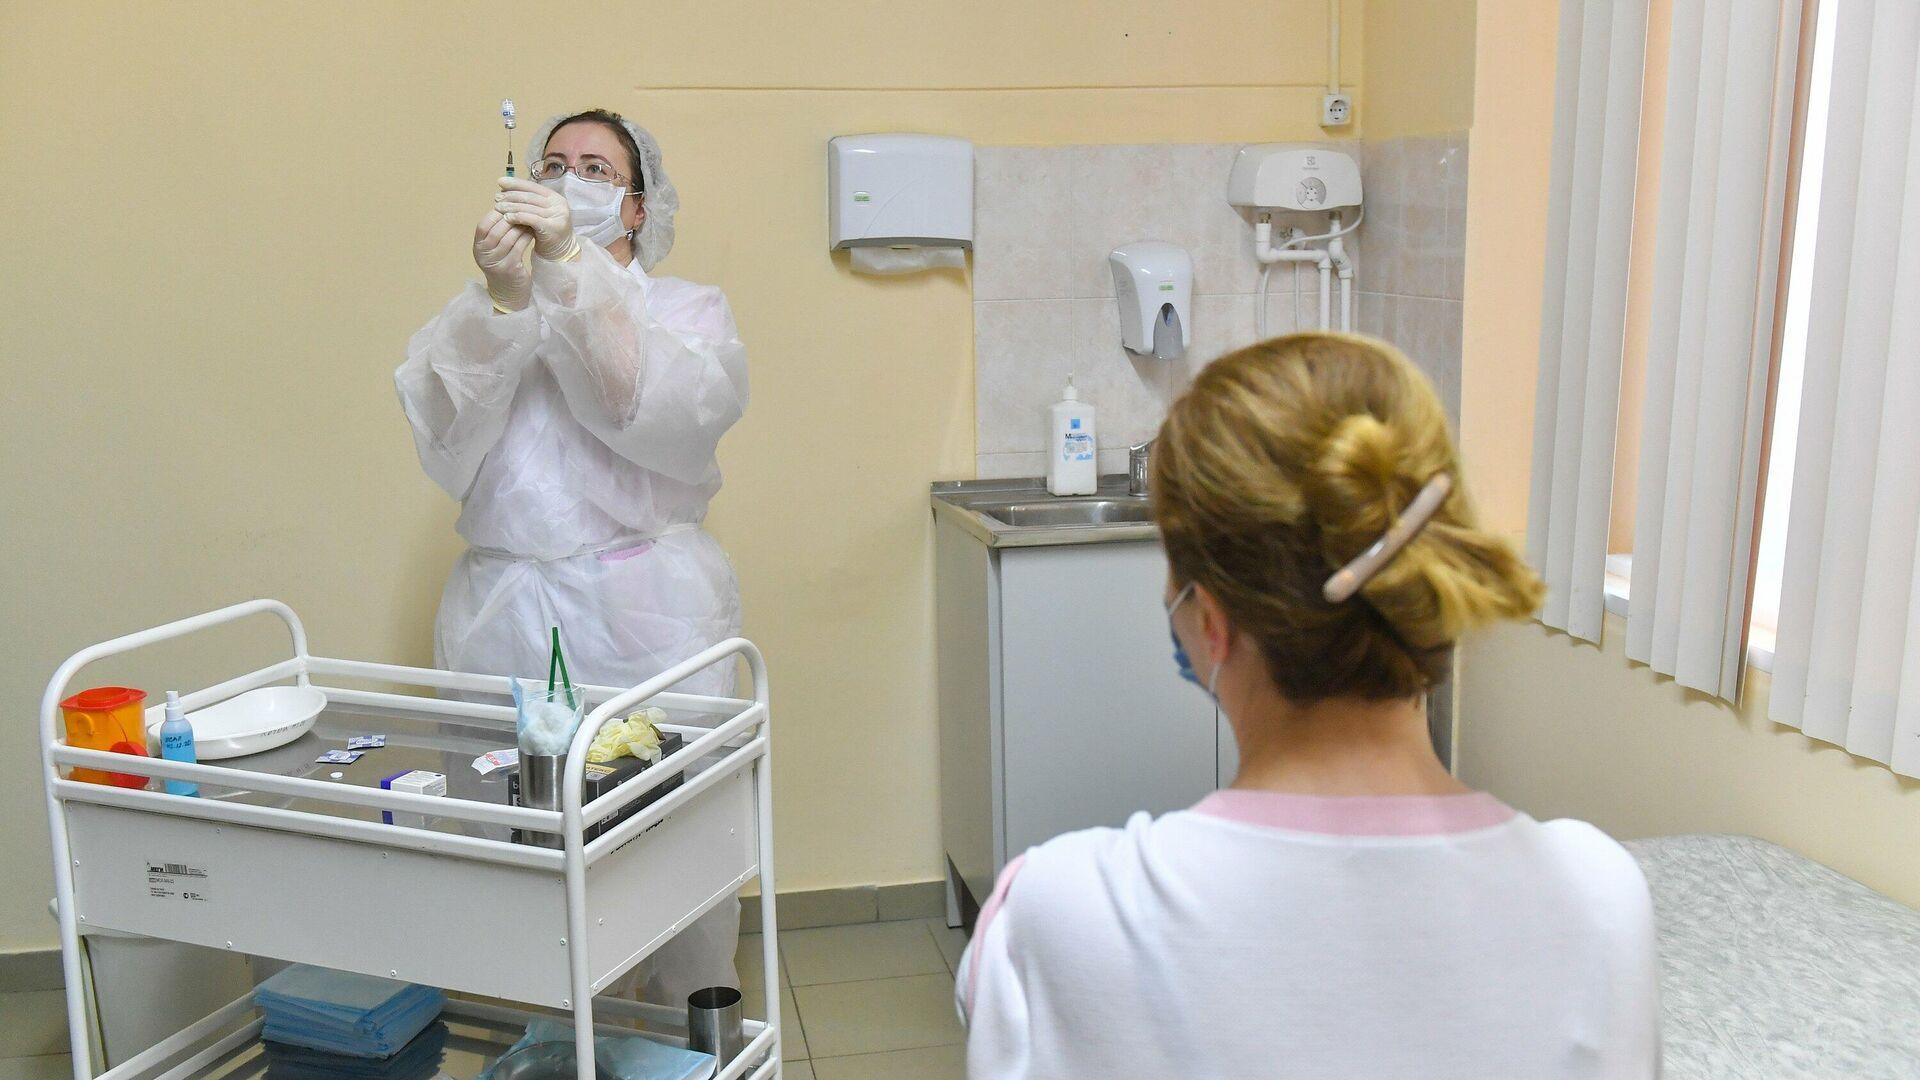 Старт масштабной вакцинации от COVID-19 в московских поликлиниках - РИА Новости, 1920, 05.12.2020